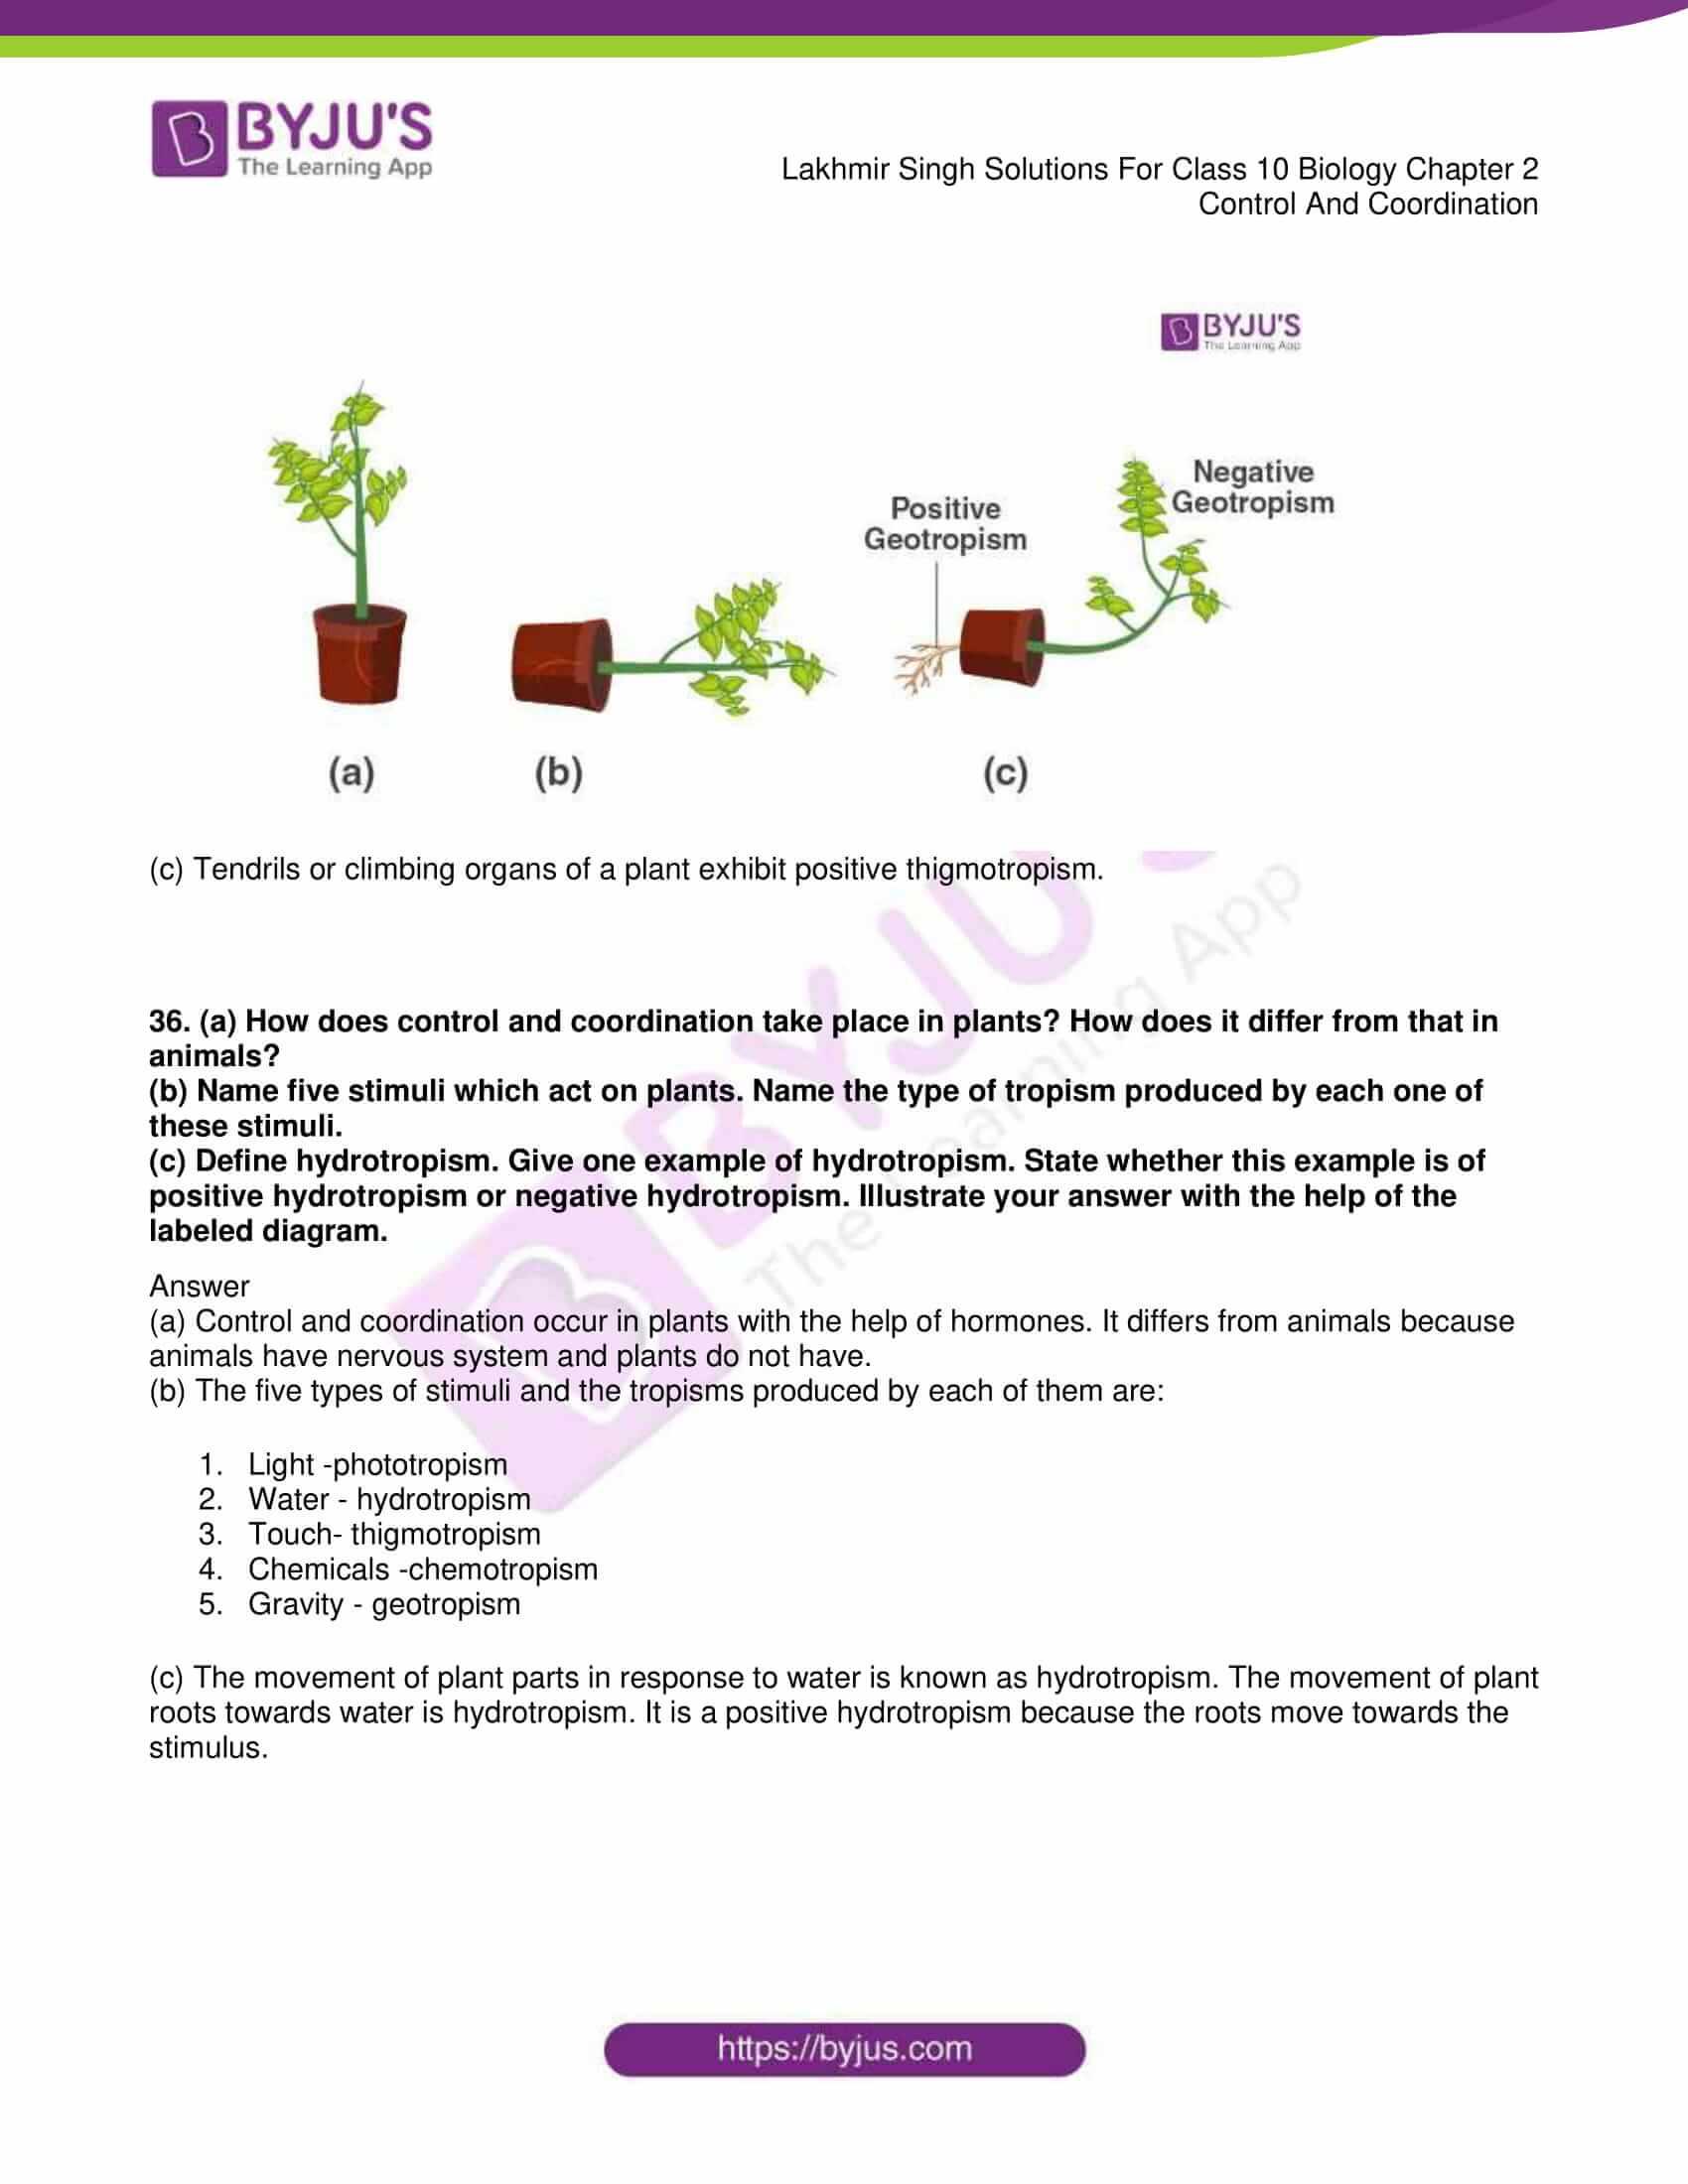 lakhmir singh sol class 10 biology chapter 2 12